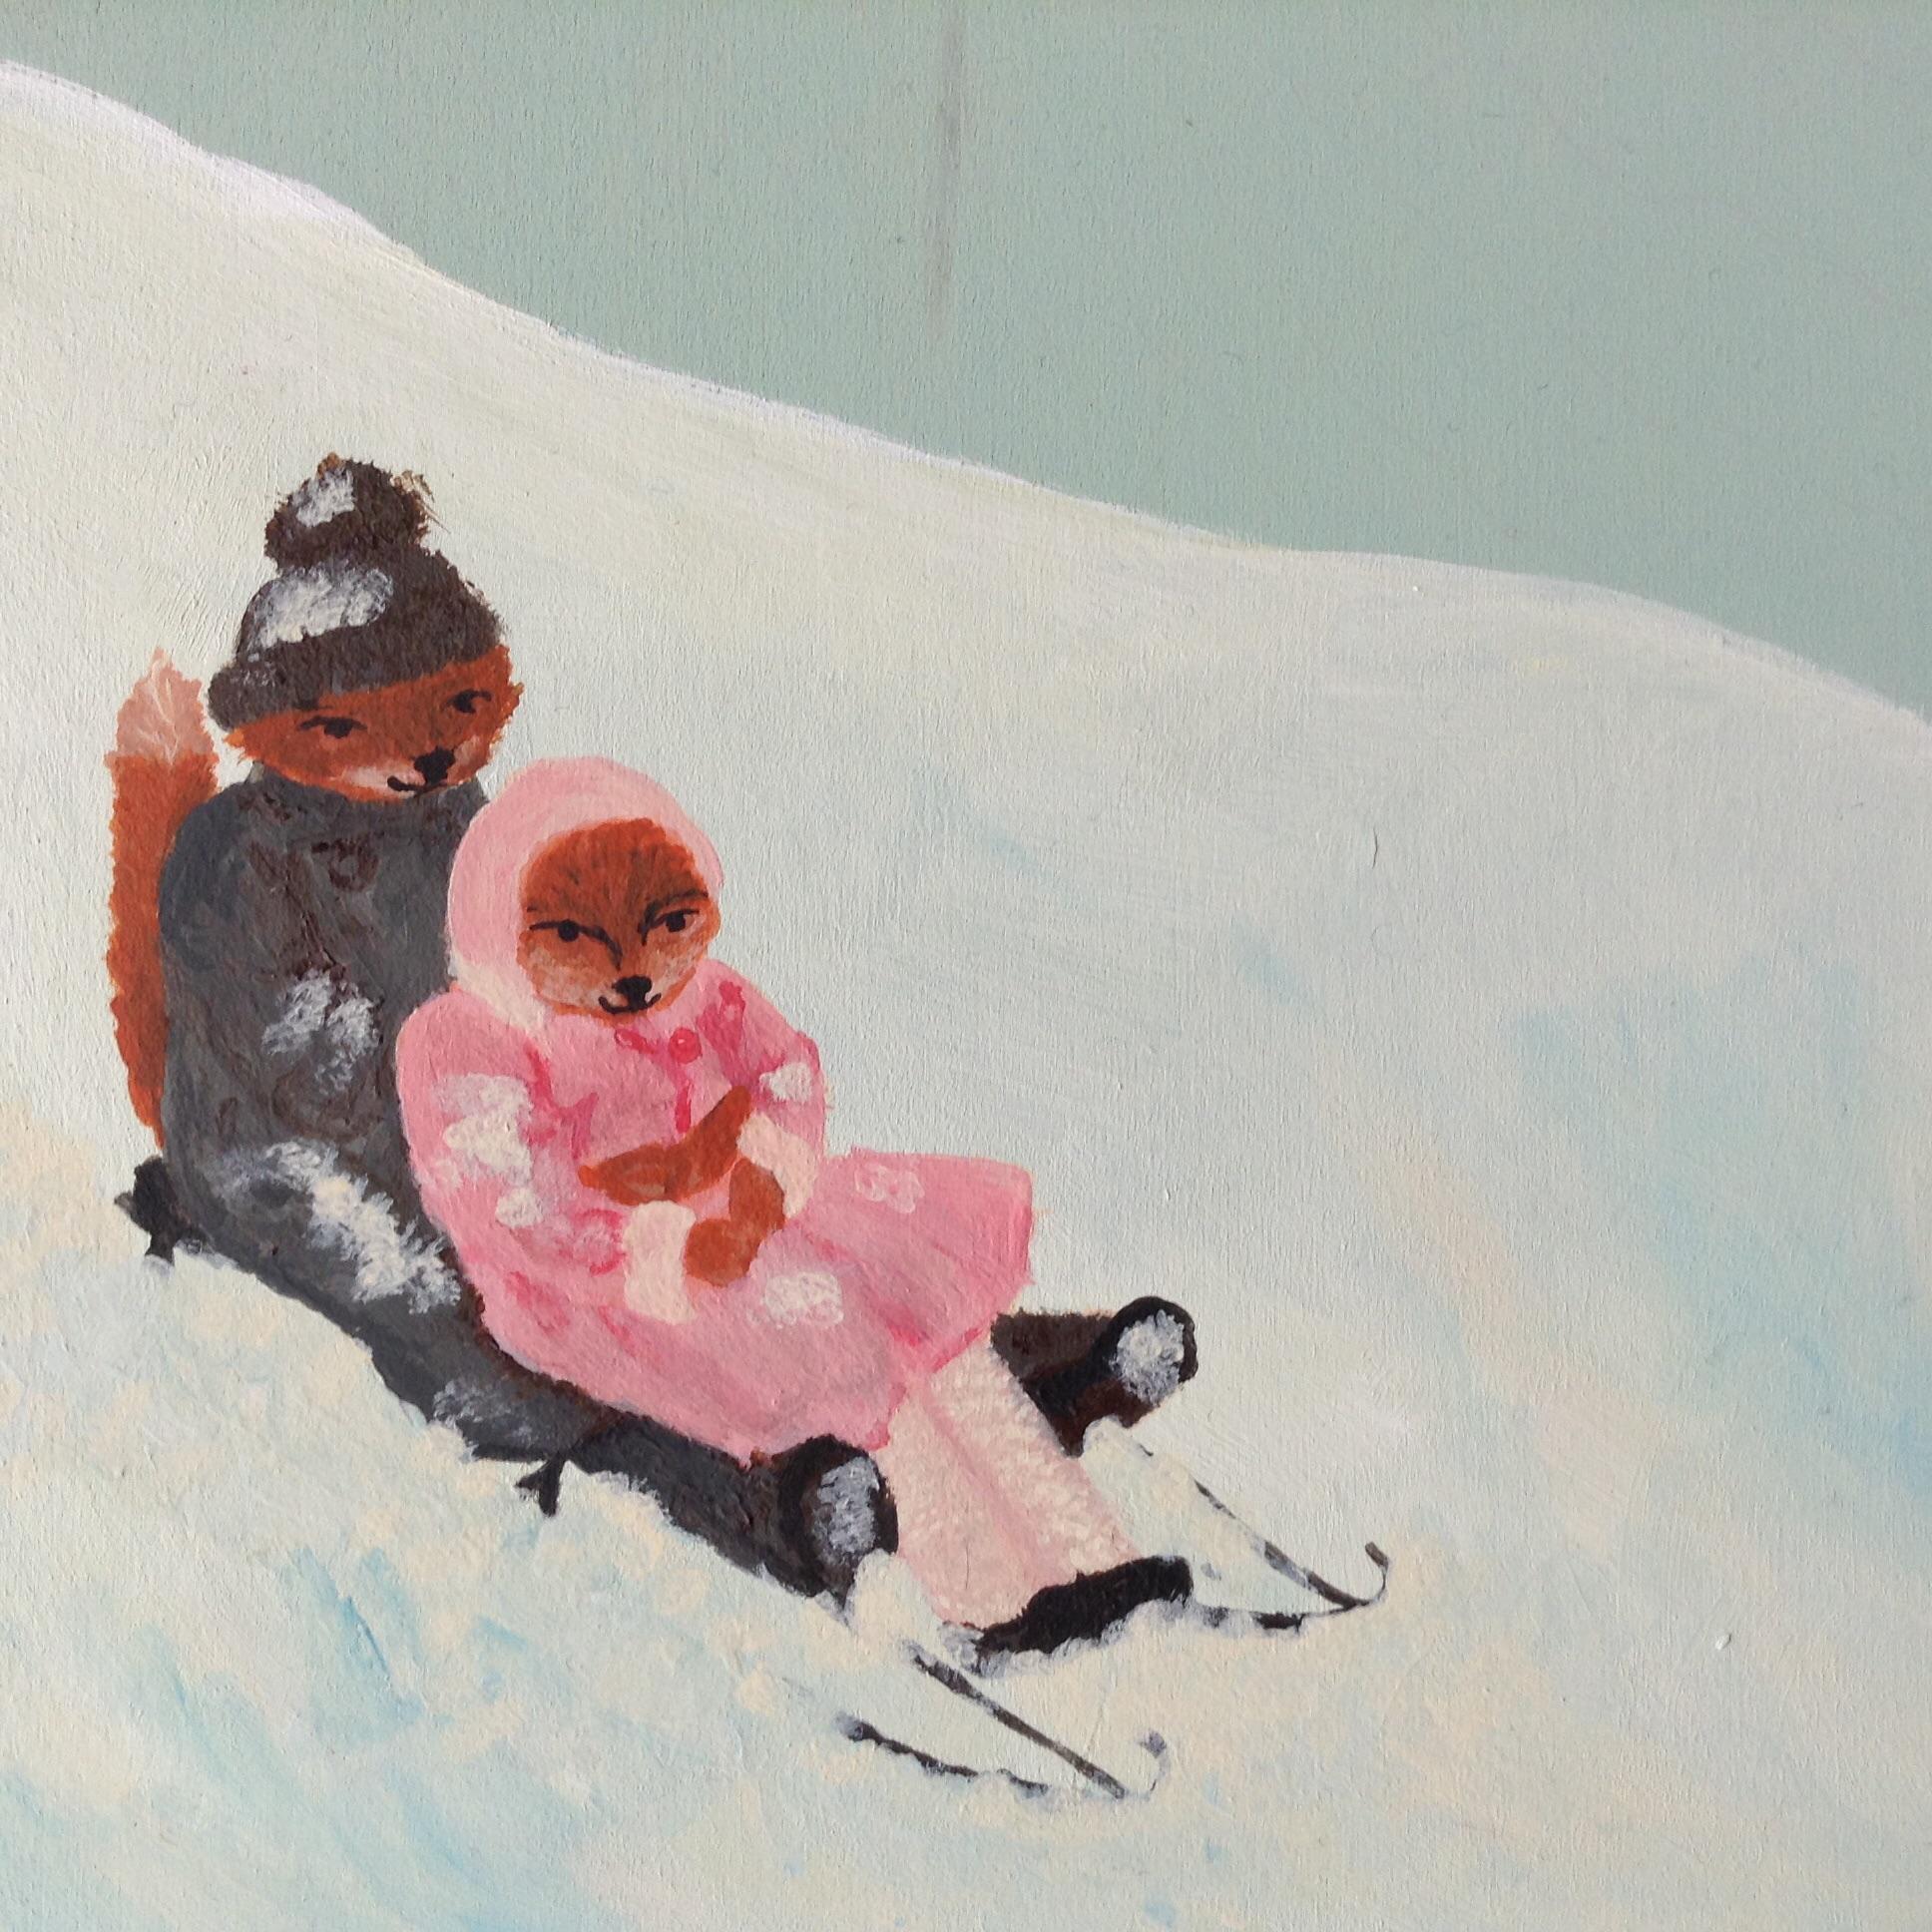 fox in the snow (sledding)